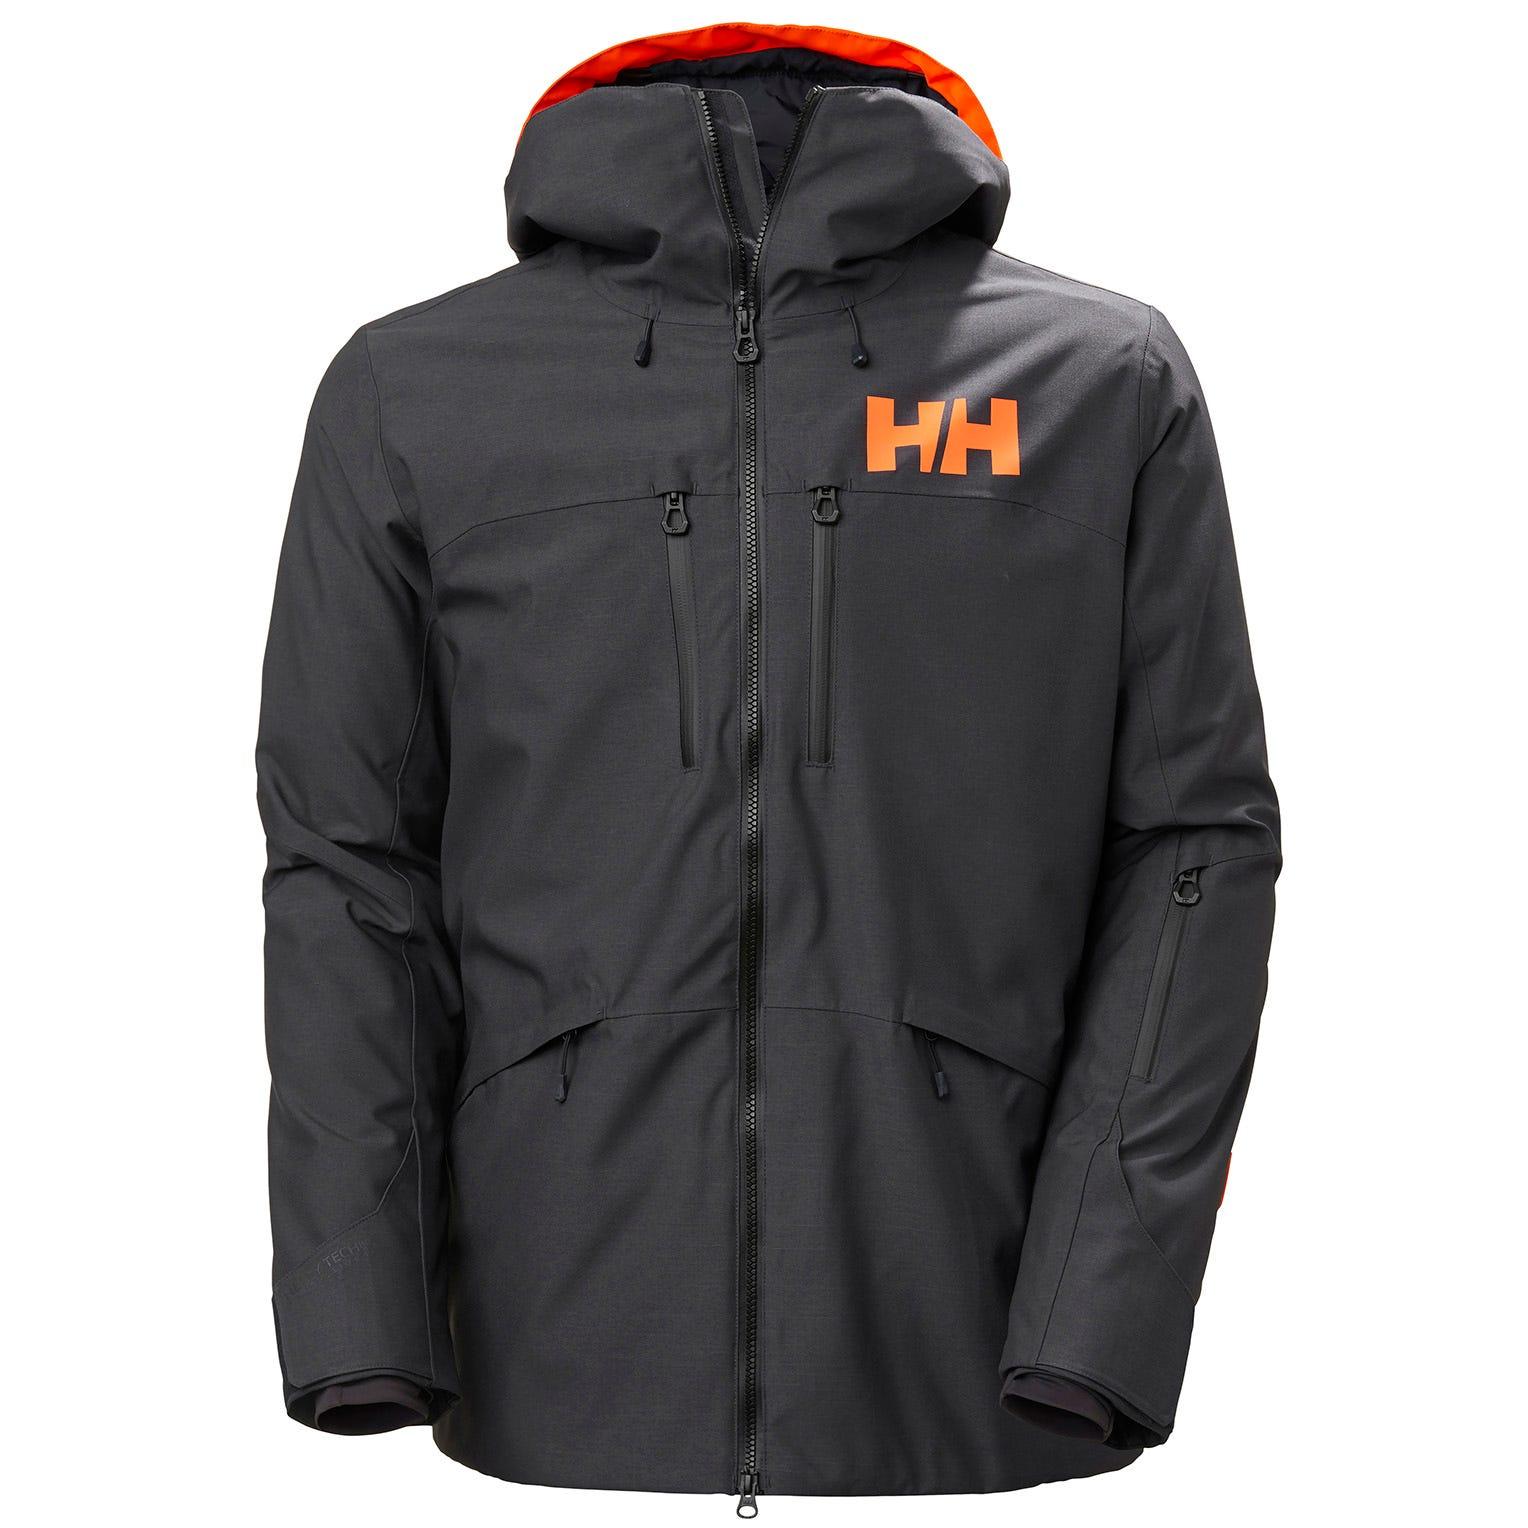 Helly Hansen Mens Garibaldi 2.0 Waterproof Ski Jacket Grey XL